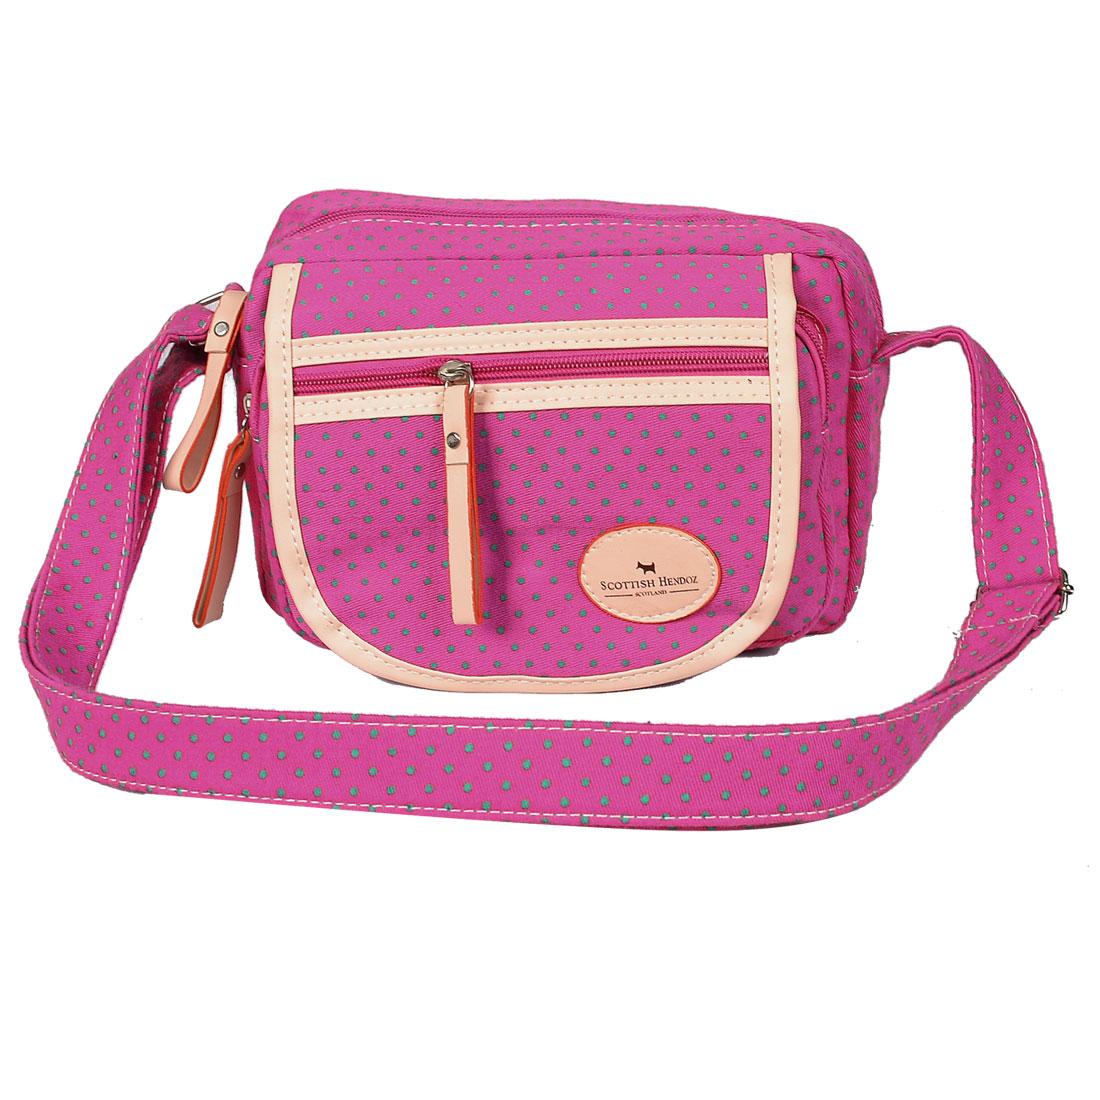 Zipper Closure Dot Pattern 3 Pockets Fuchsia Shoulder Bag Handbag for Lady